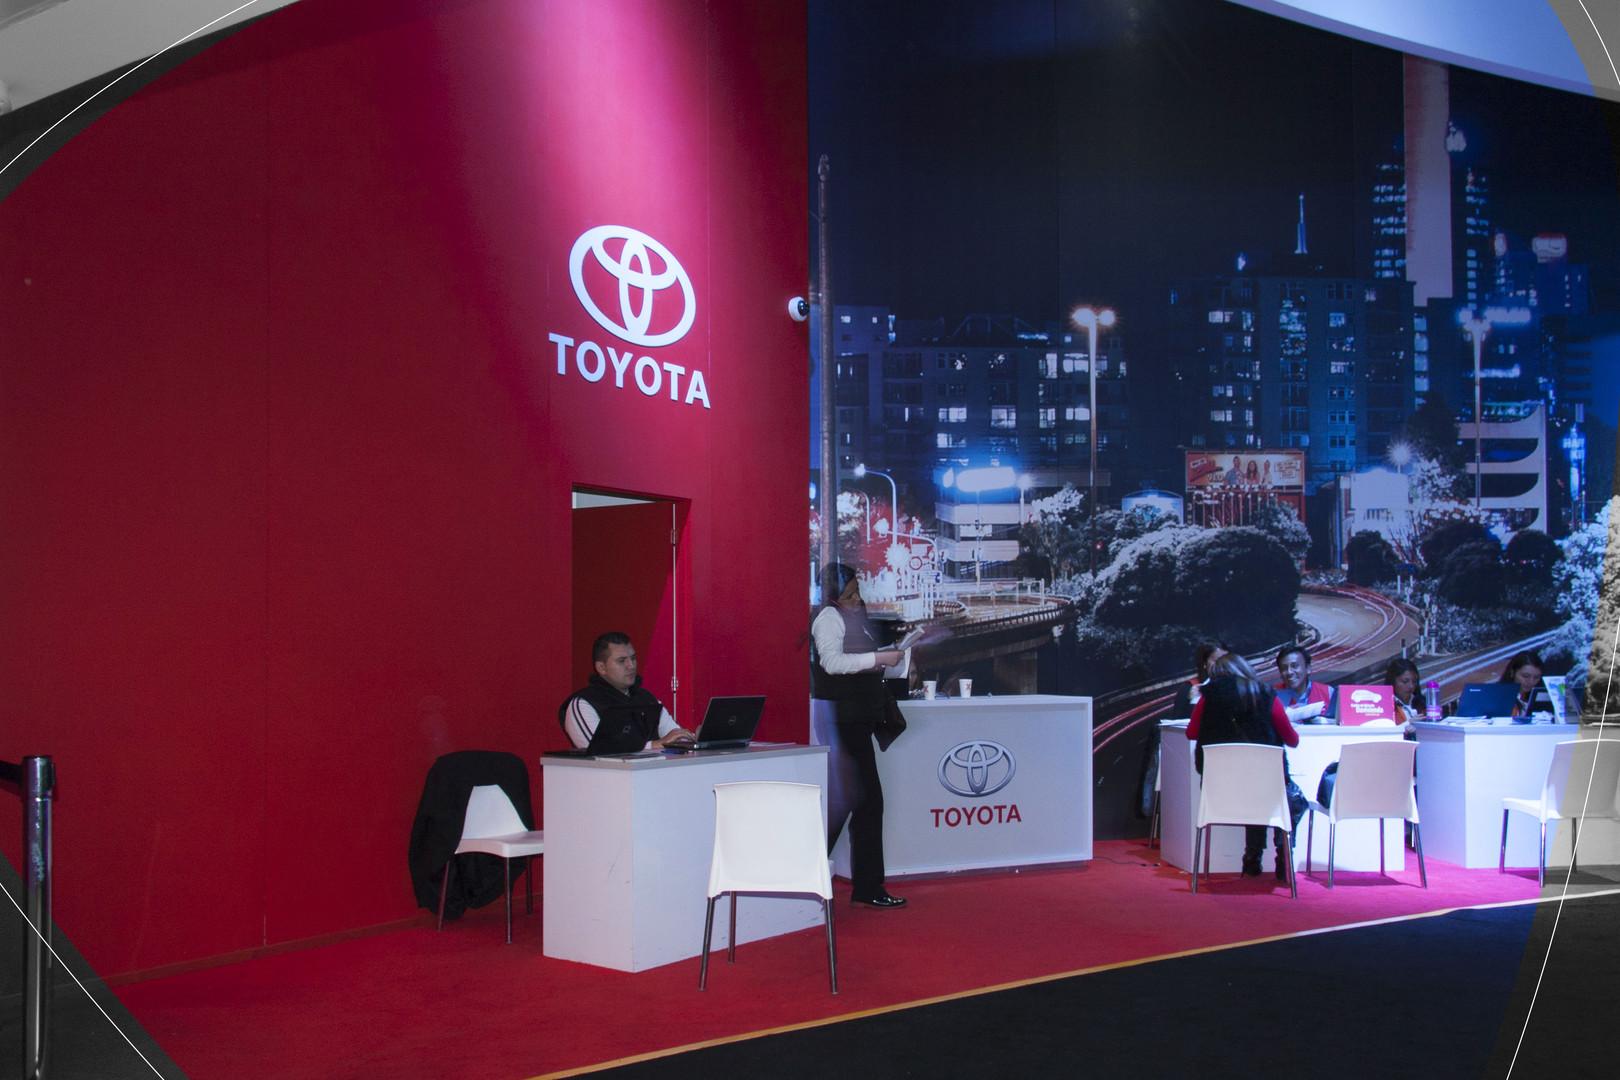 Toyota IMG_8241_1.JPG